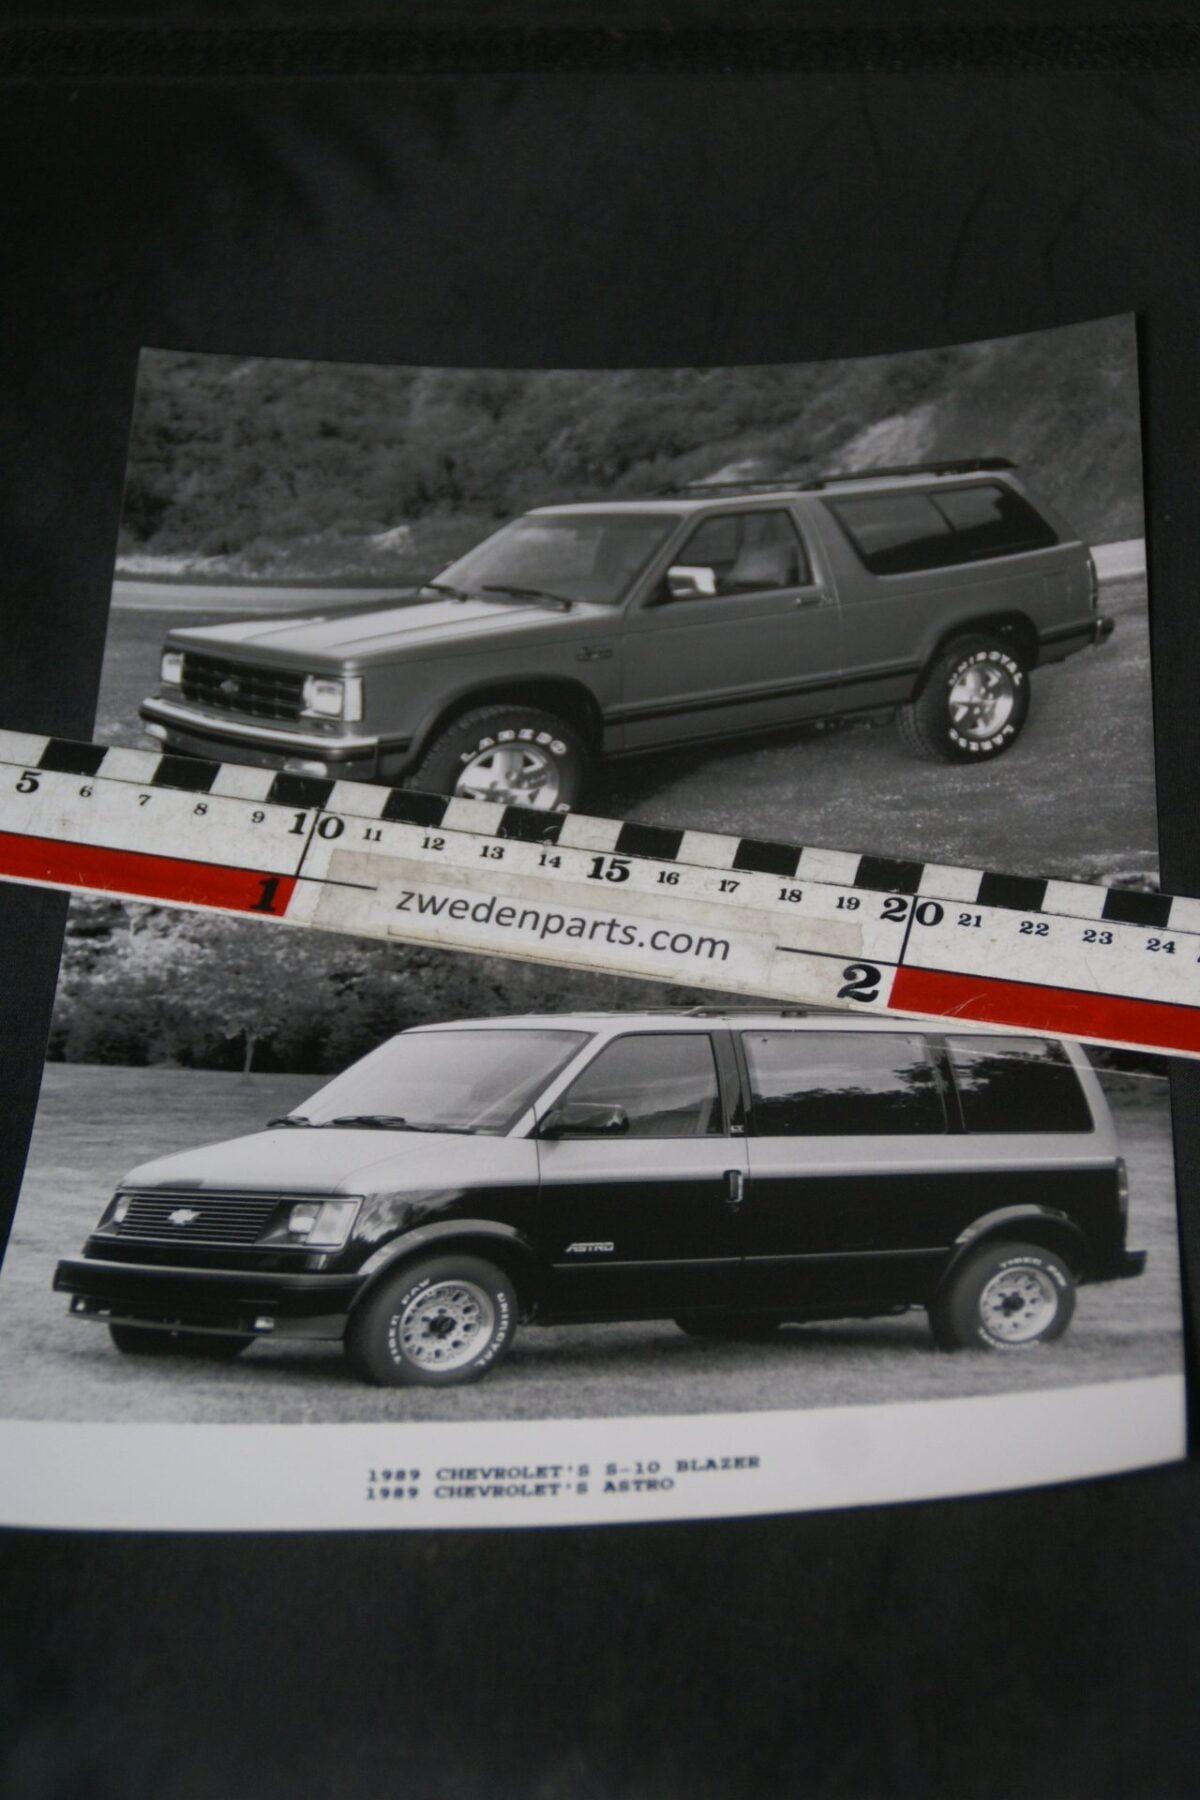 DSC05199 1989 originele persfoto Chevrolet Blazer en Astro